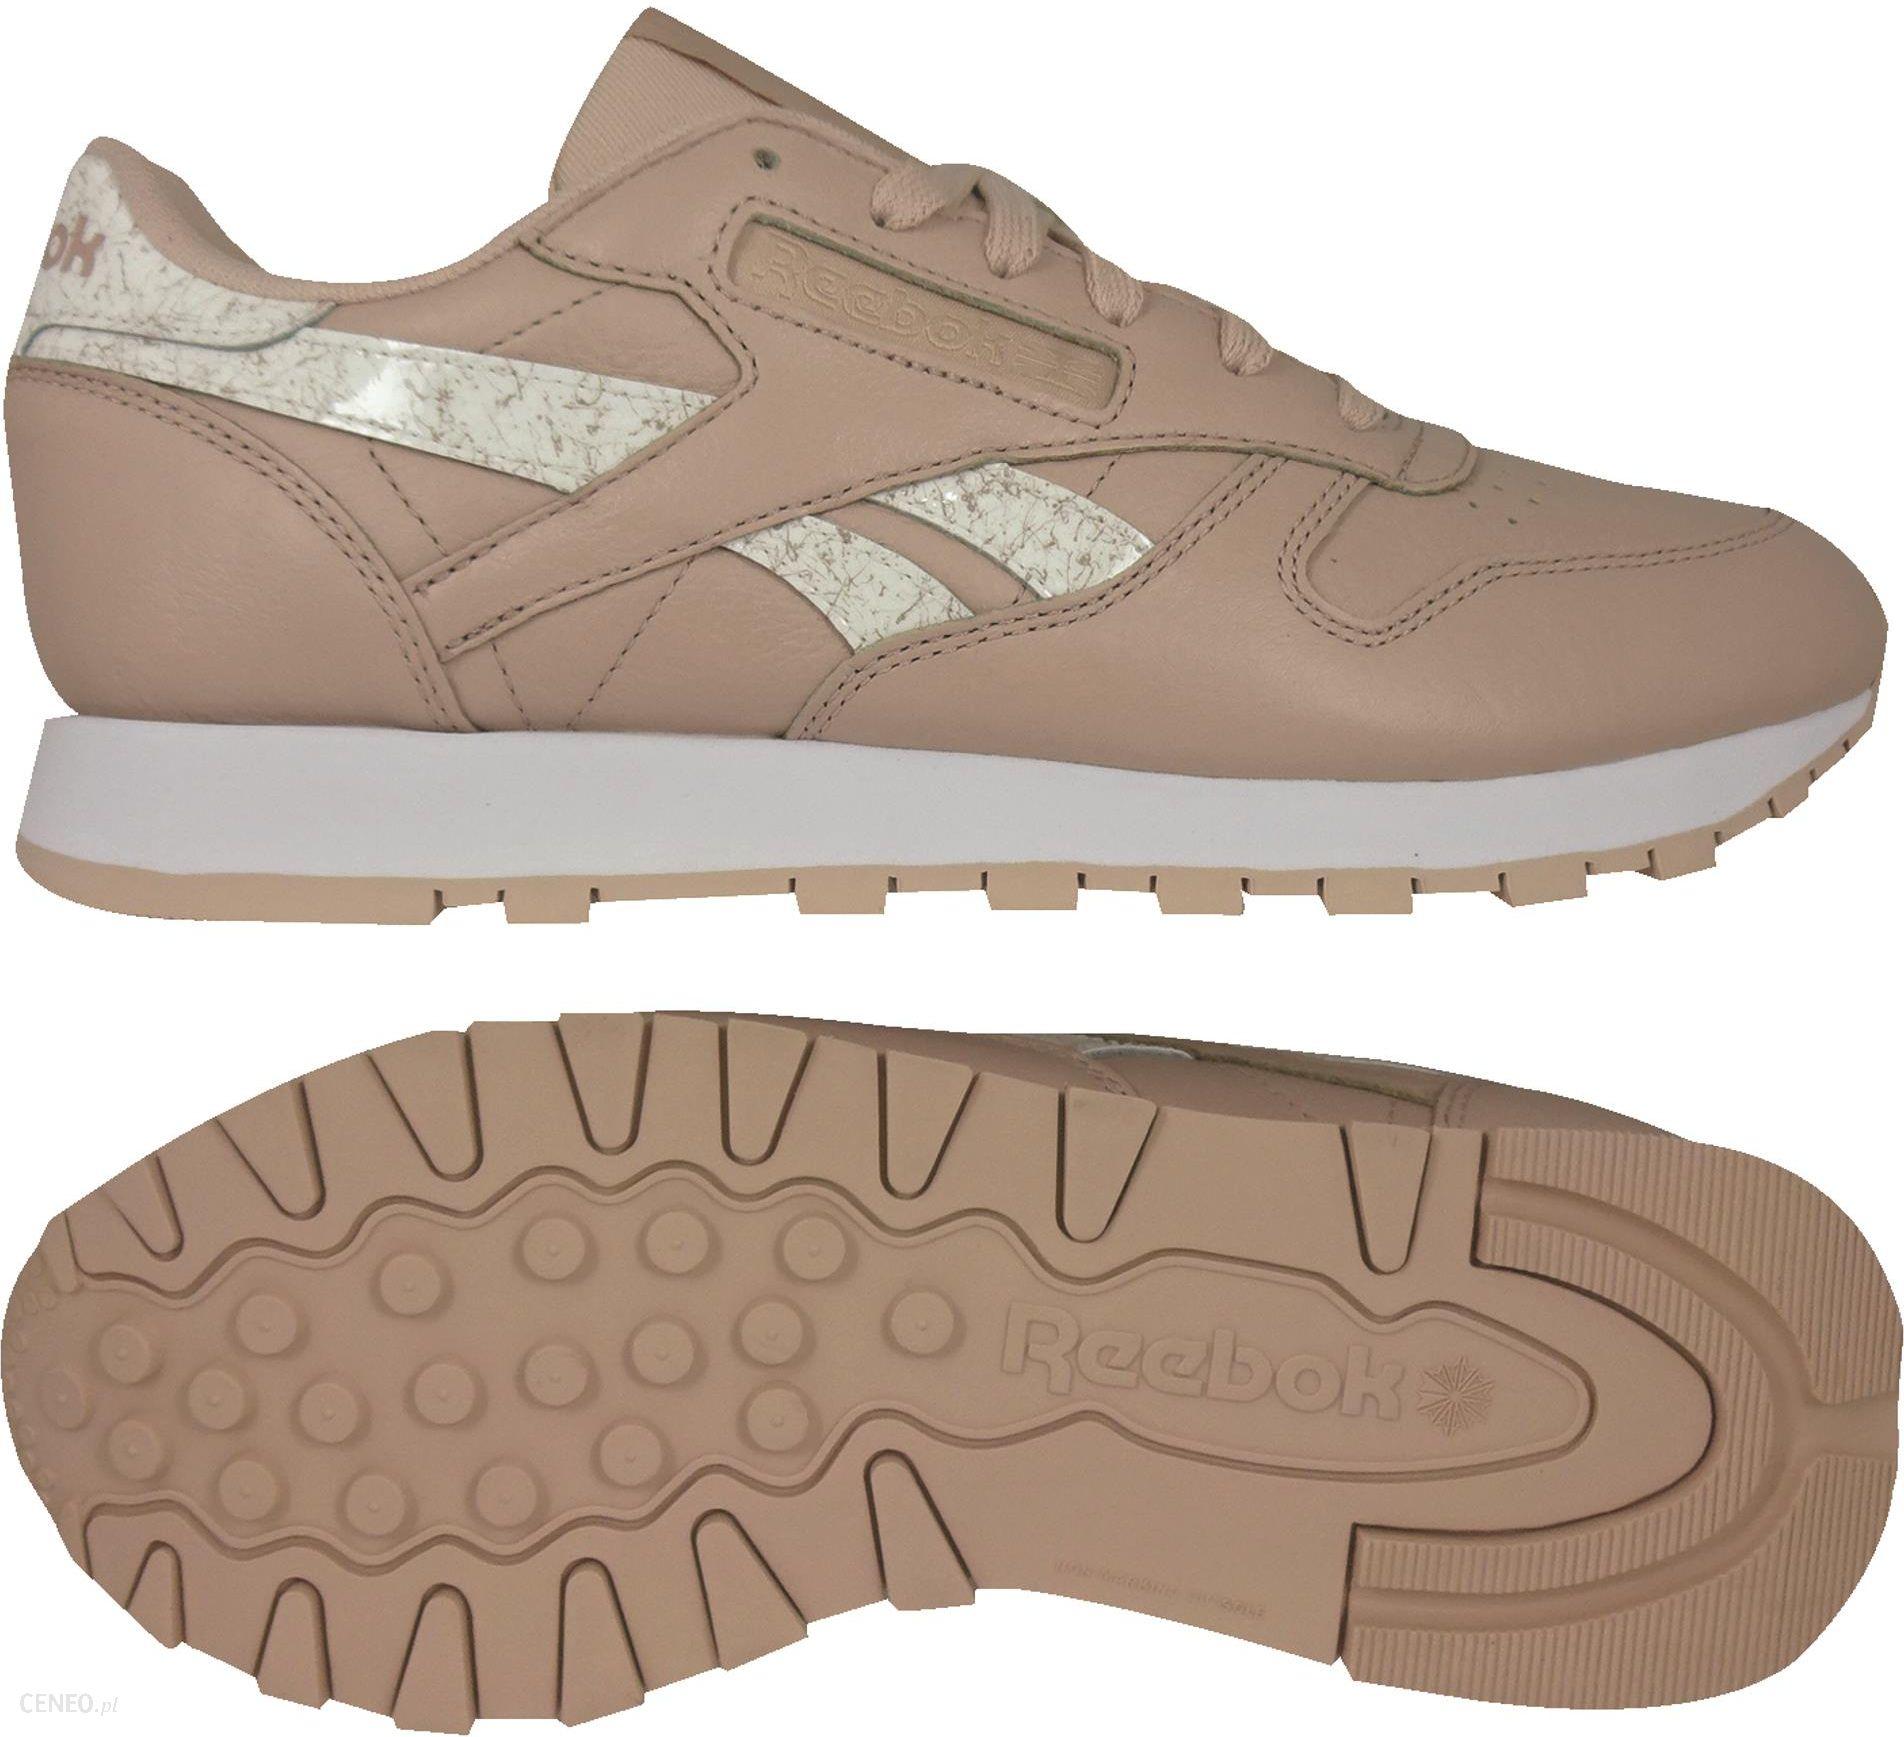 Buty damskie sneakersy Reebok Classic Leather CN4020